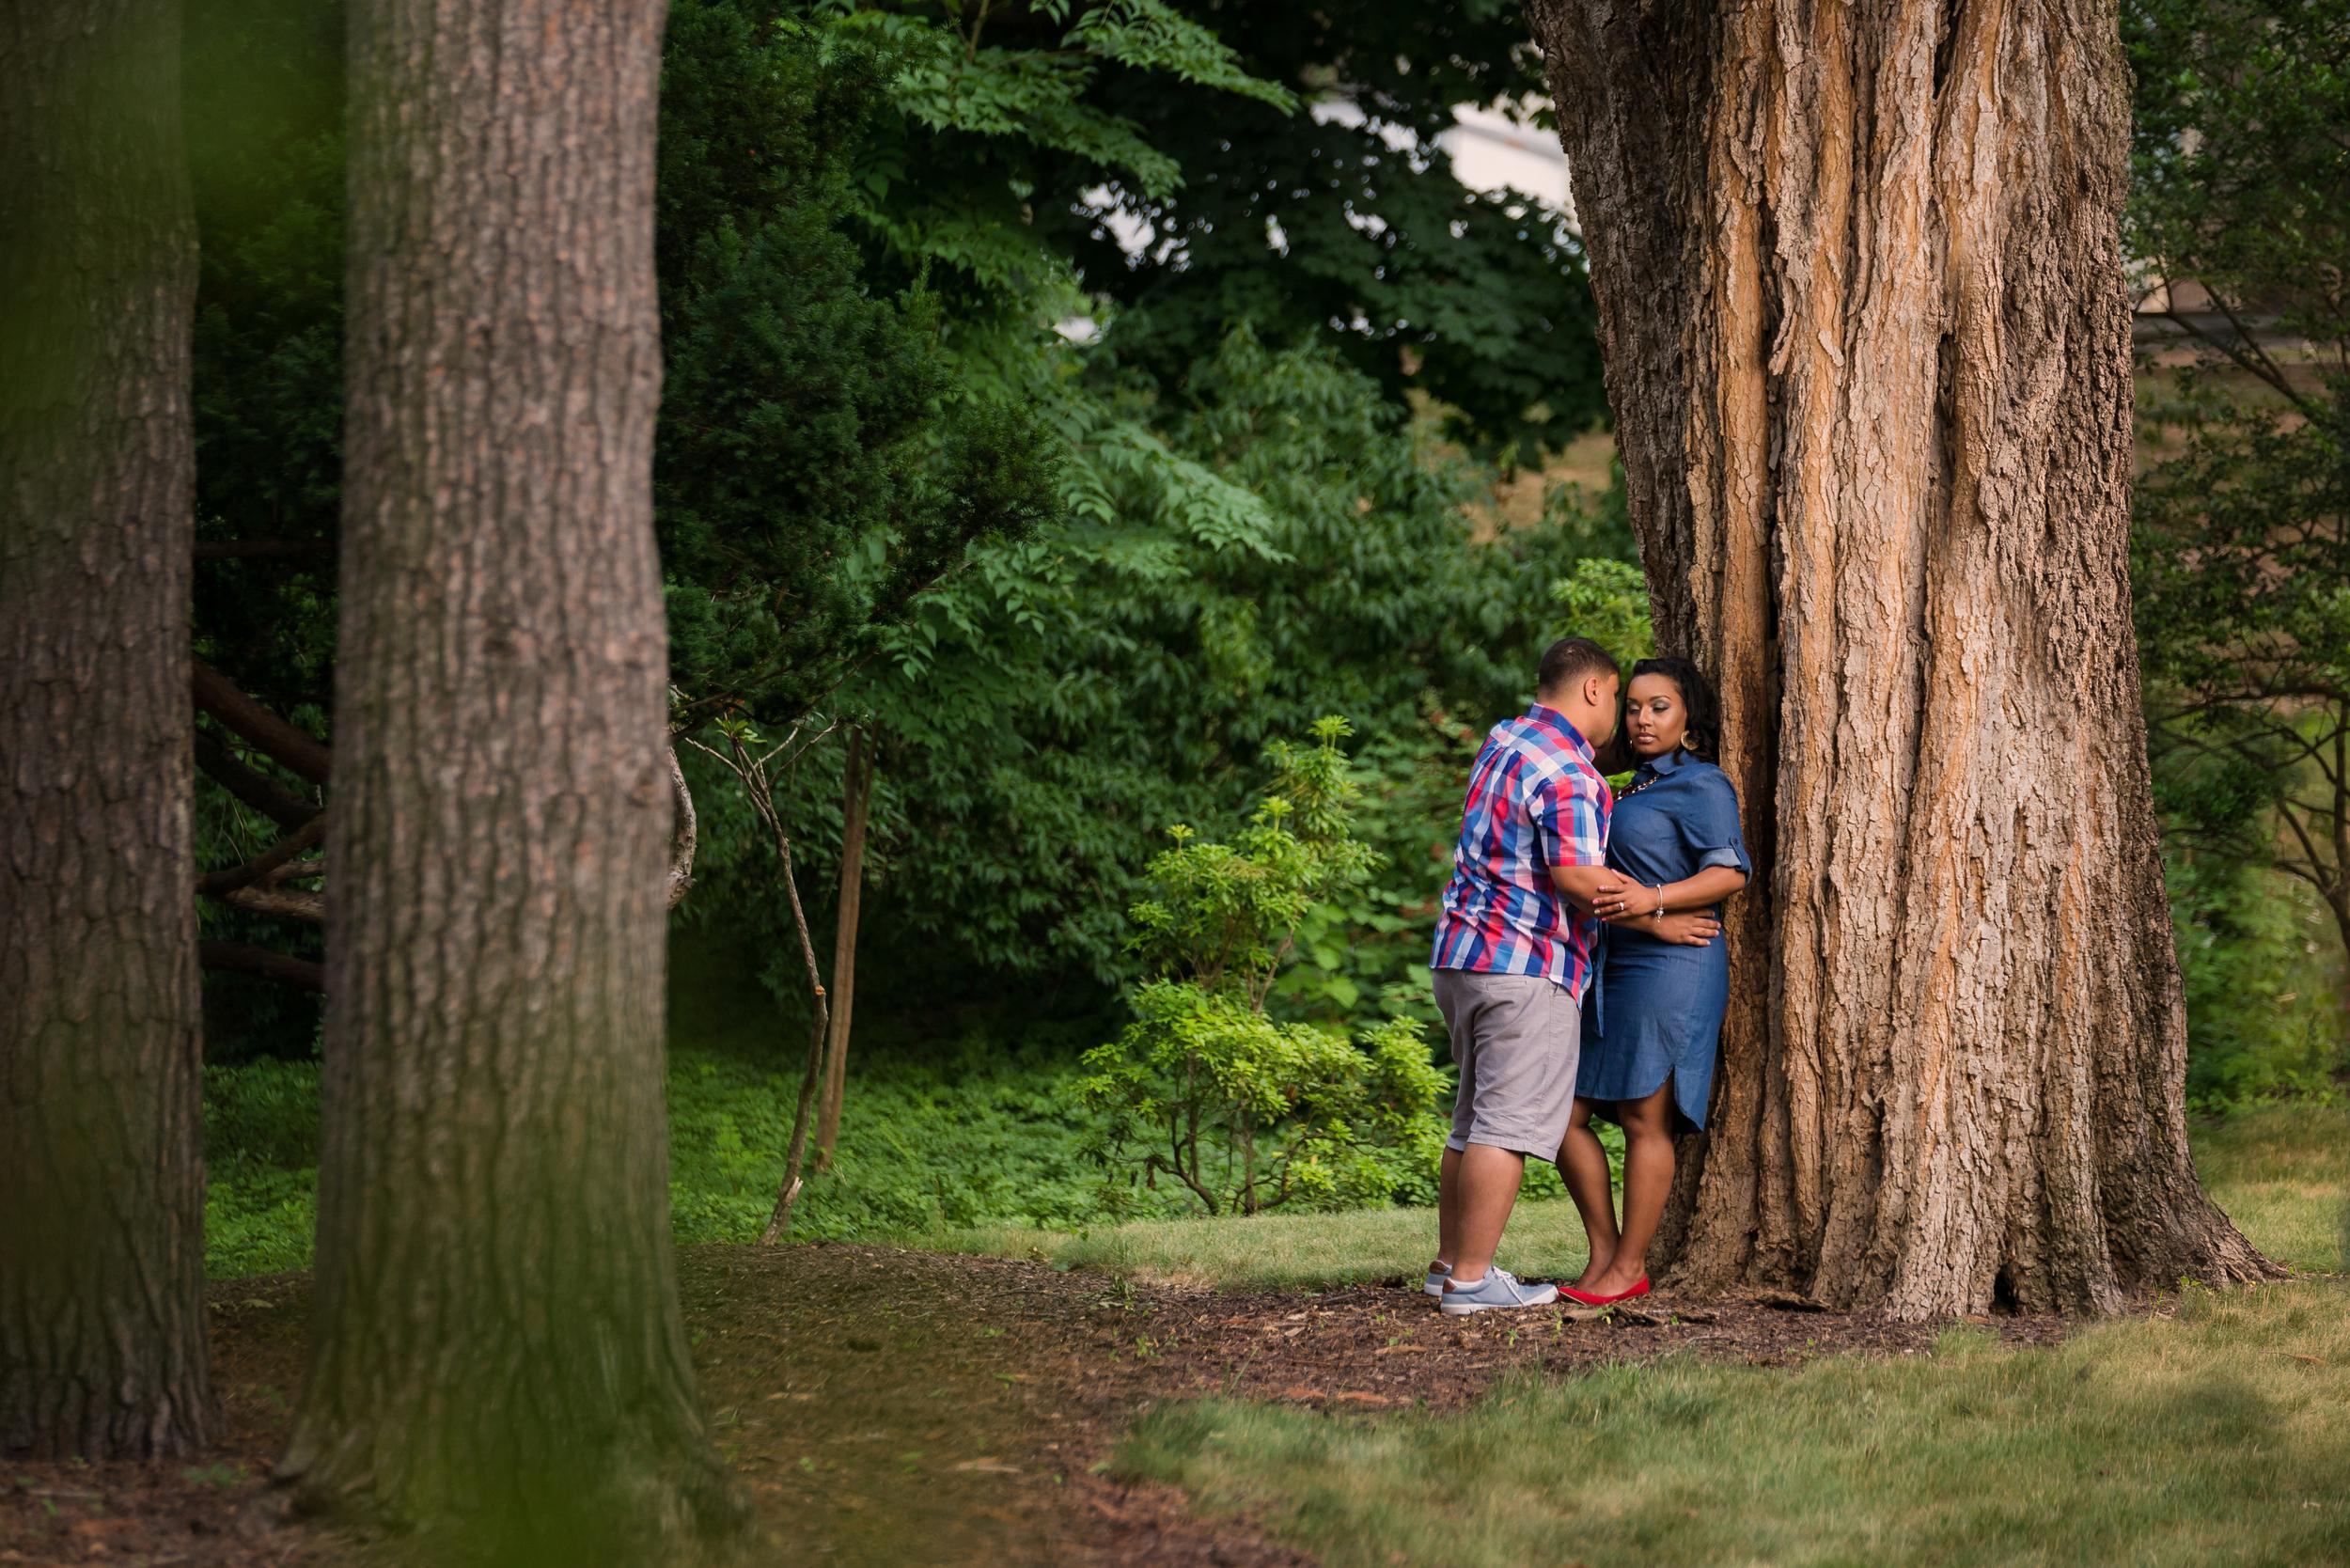 Isela-Joshua-Love-Story-Garcia-Photography-2719.jpg